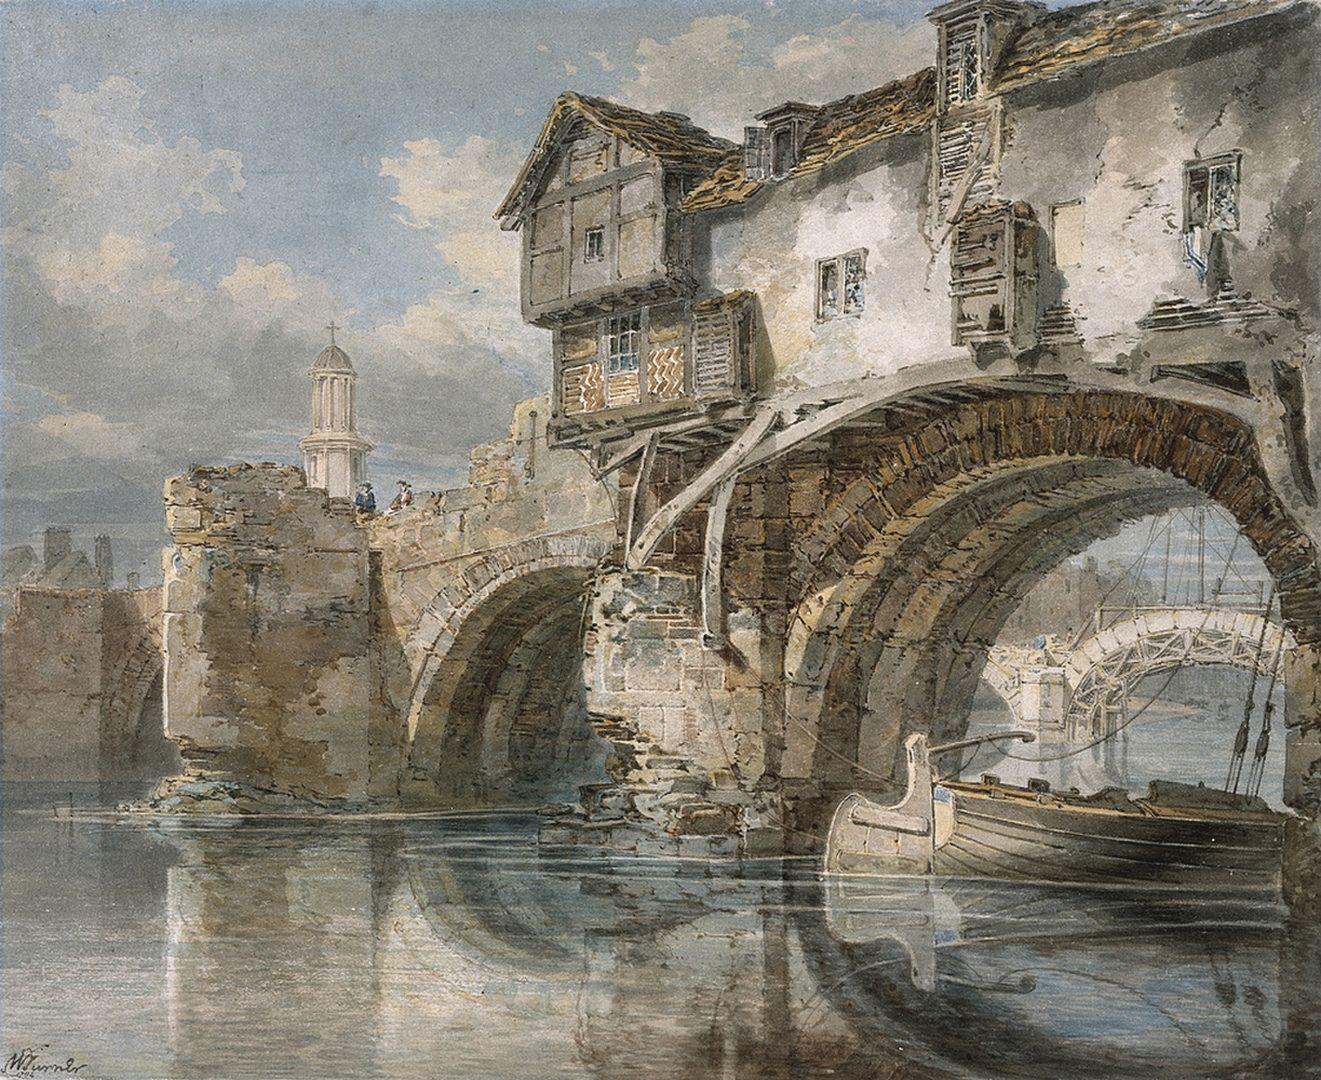 Old Welsh Bridge, Shrewsbury, Shropshire, 1794. Joseph Mallord William Turner.